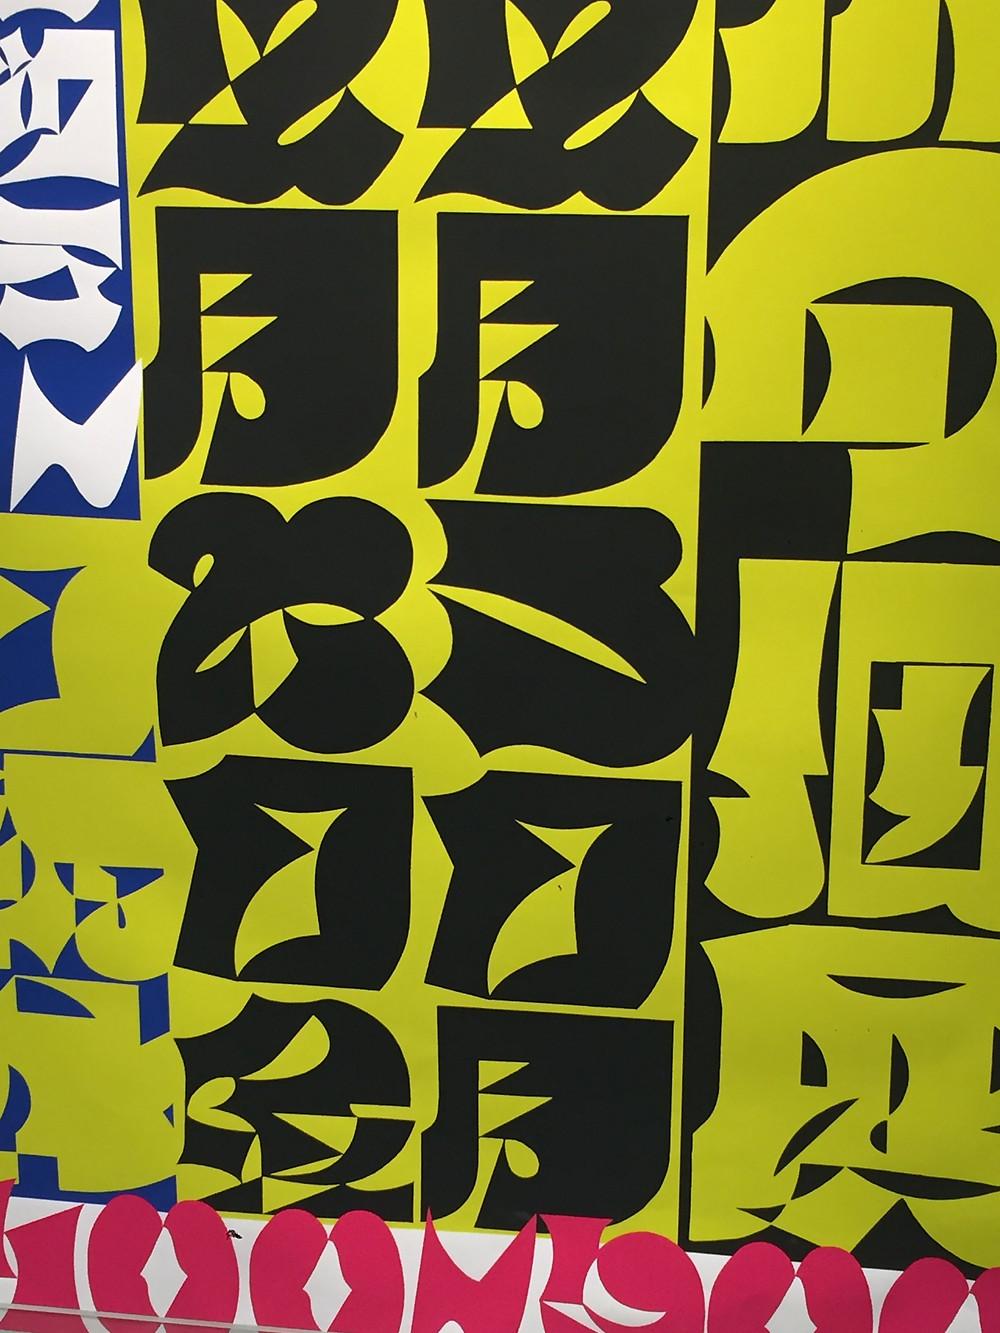 Neon and black kanji typography poster